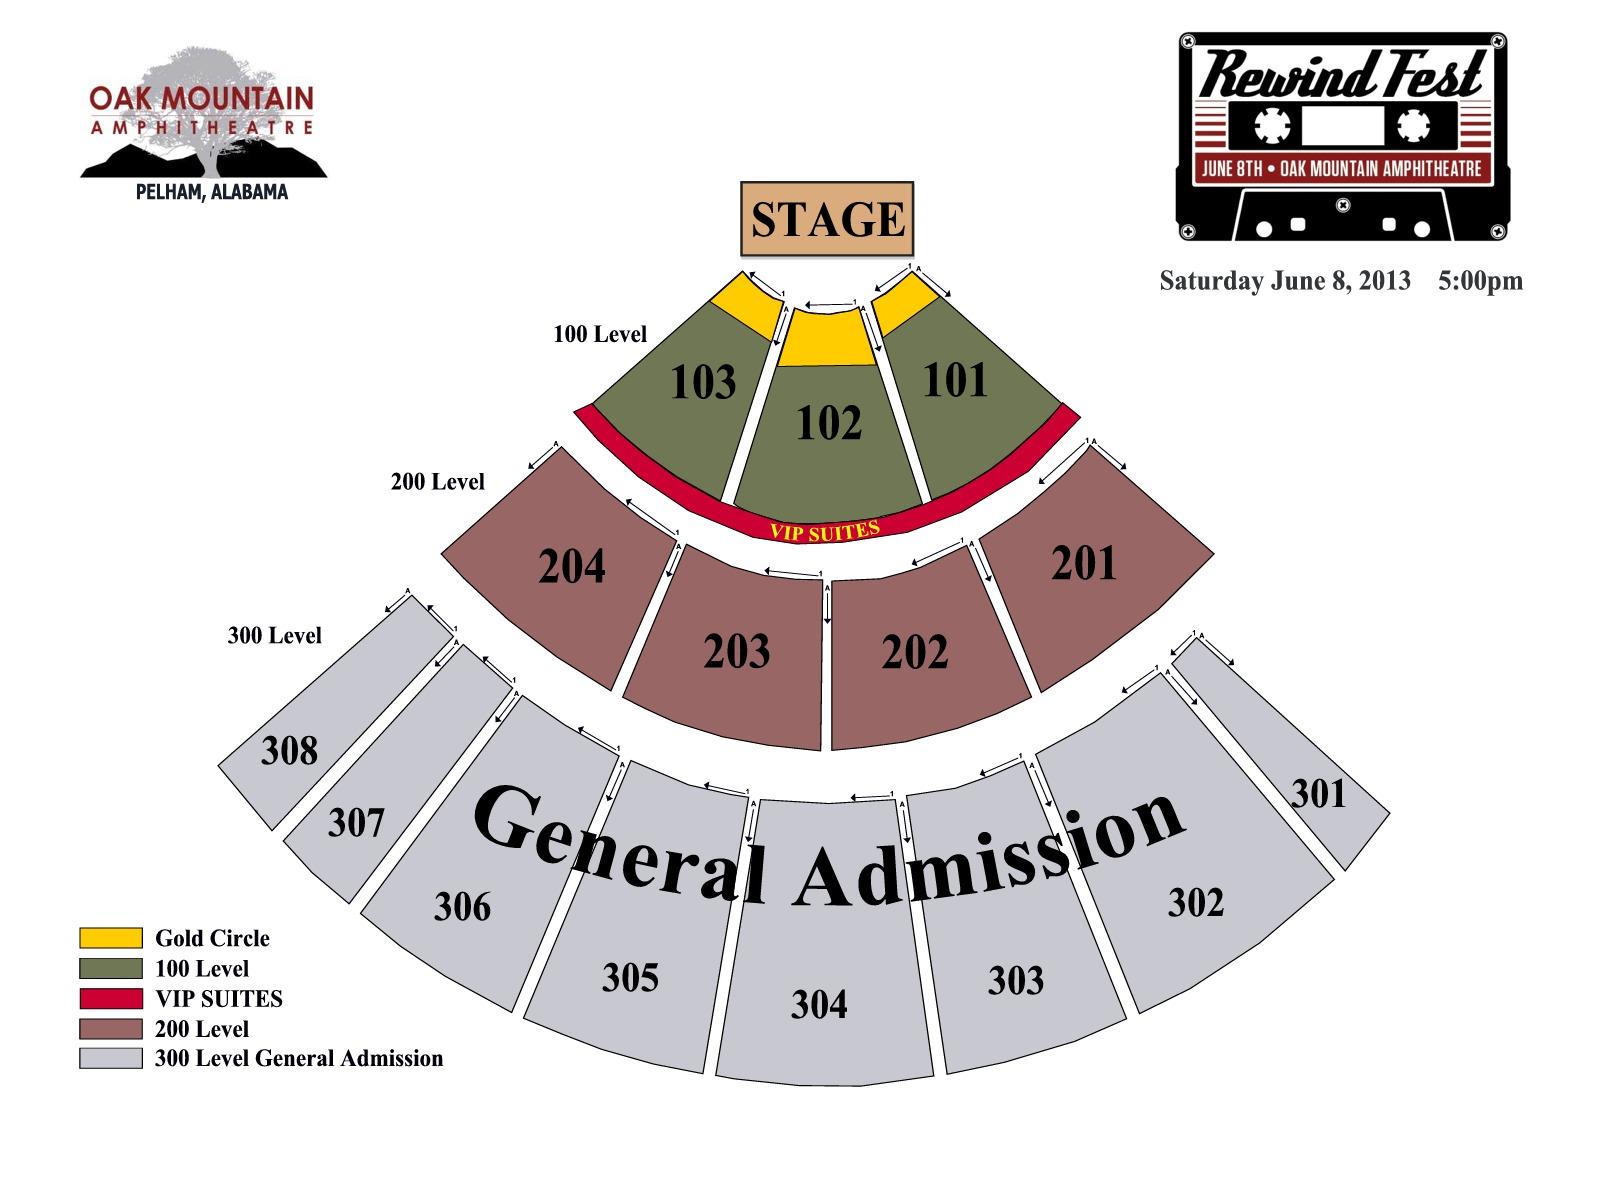 Oak mountain amphitheatre birmingham tickets schedule seating chart directions